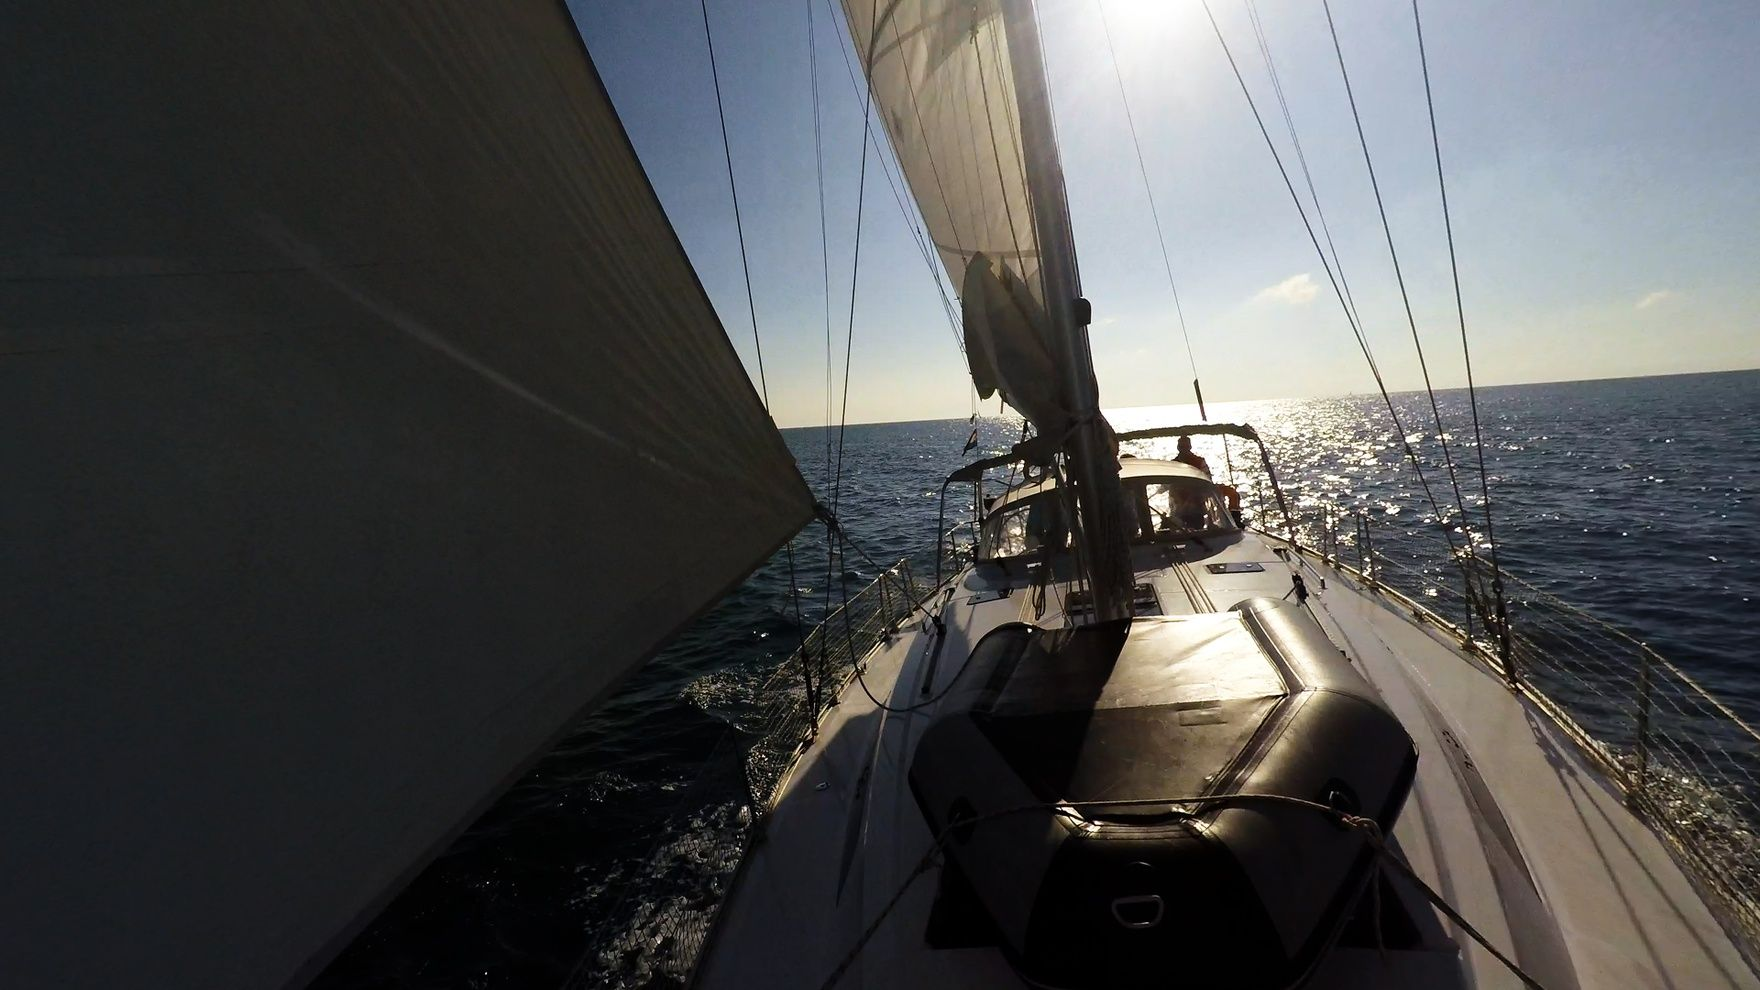 A training week + «Trophee Port Grimaud» regatta